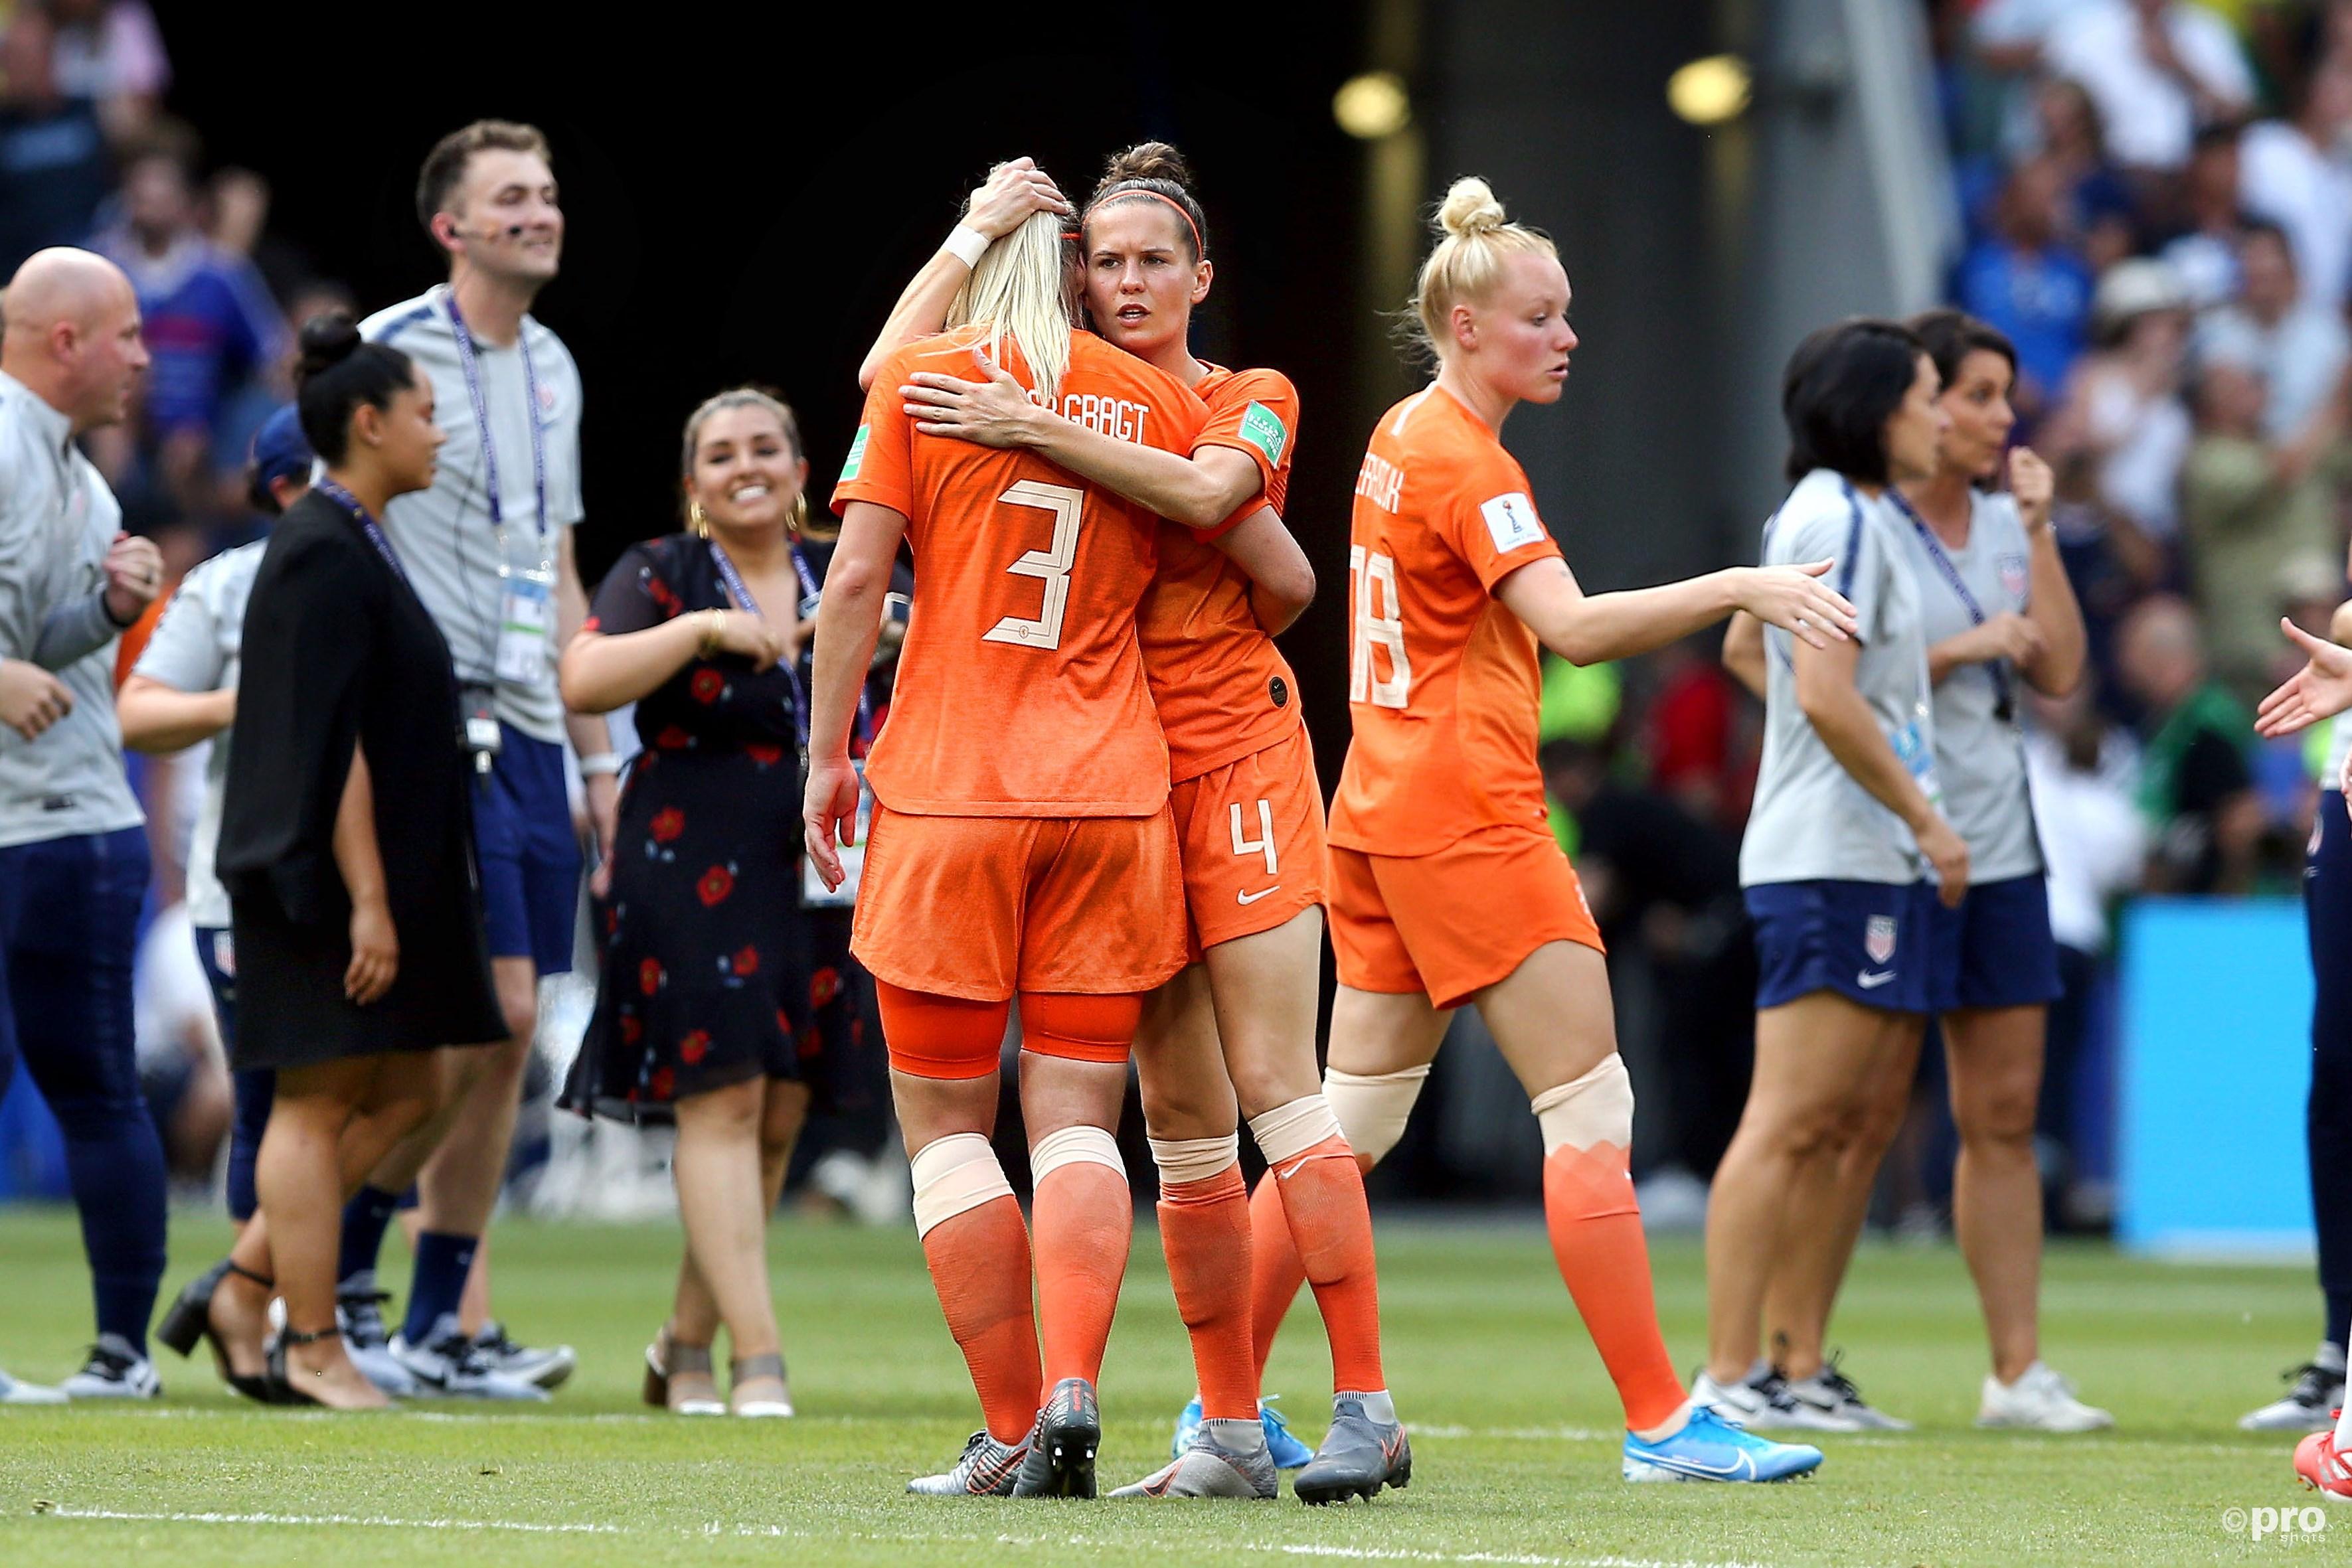 Nederland verliest finale WK voetbal (Pro Shots / Remko Kool)